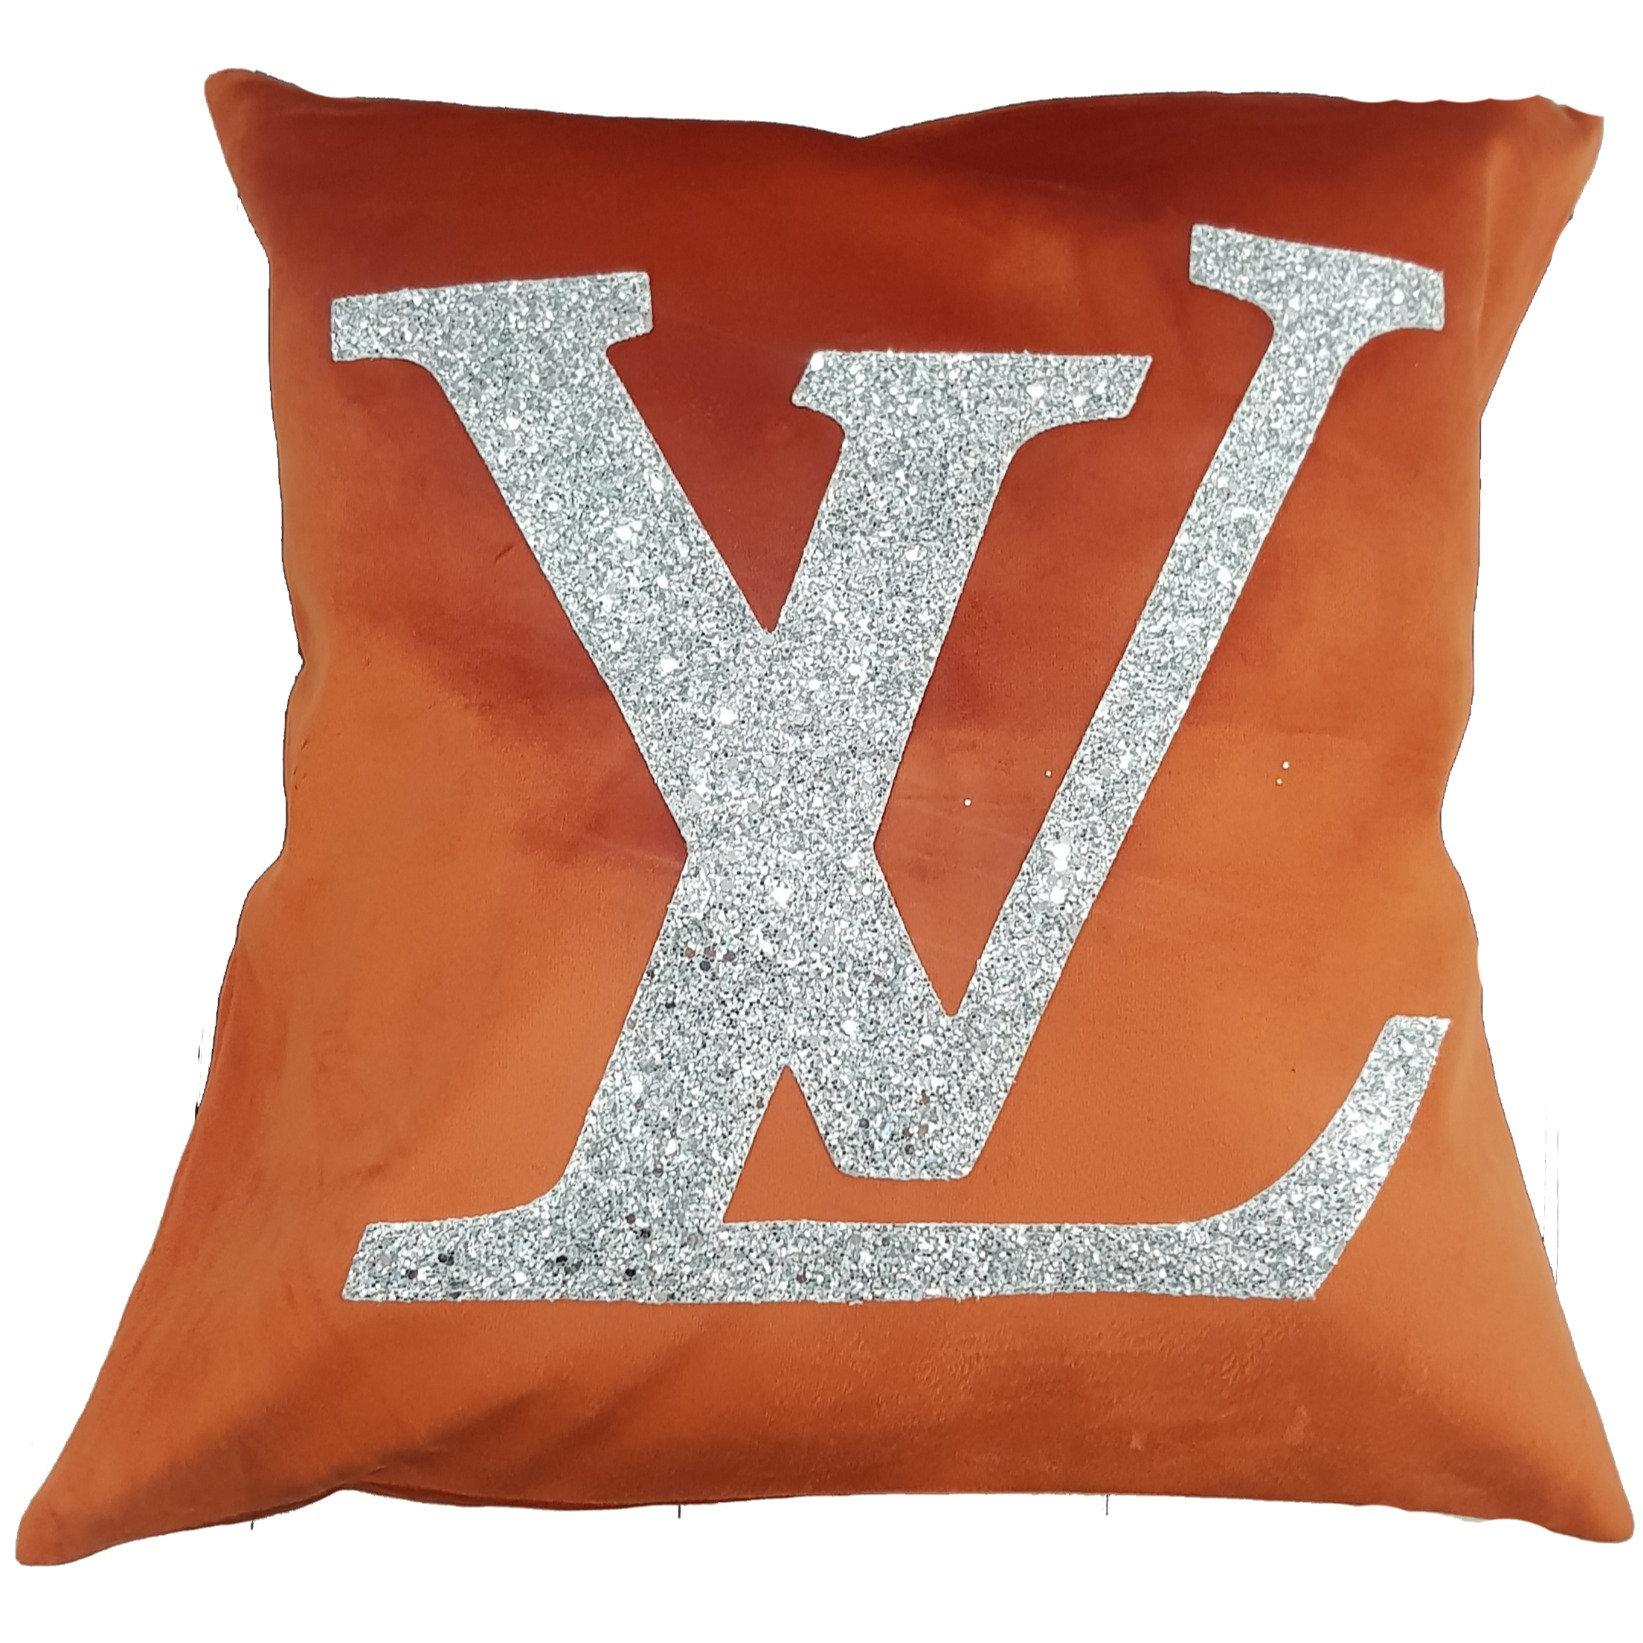 lv logo cushion orange velvet with silver glitter cosy home cushions